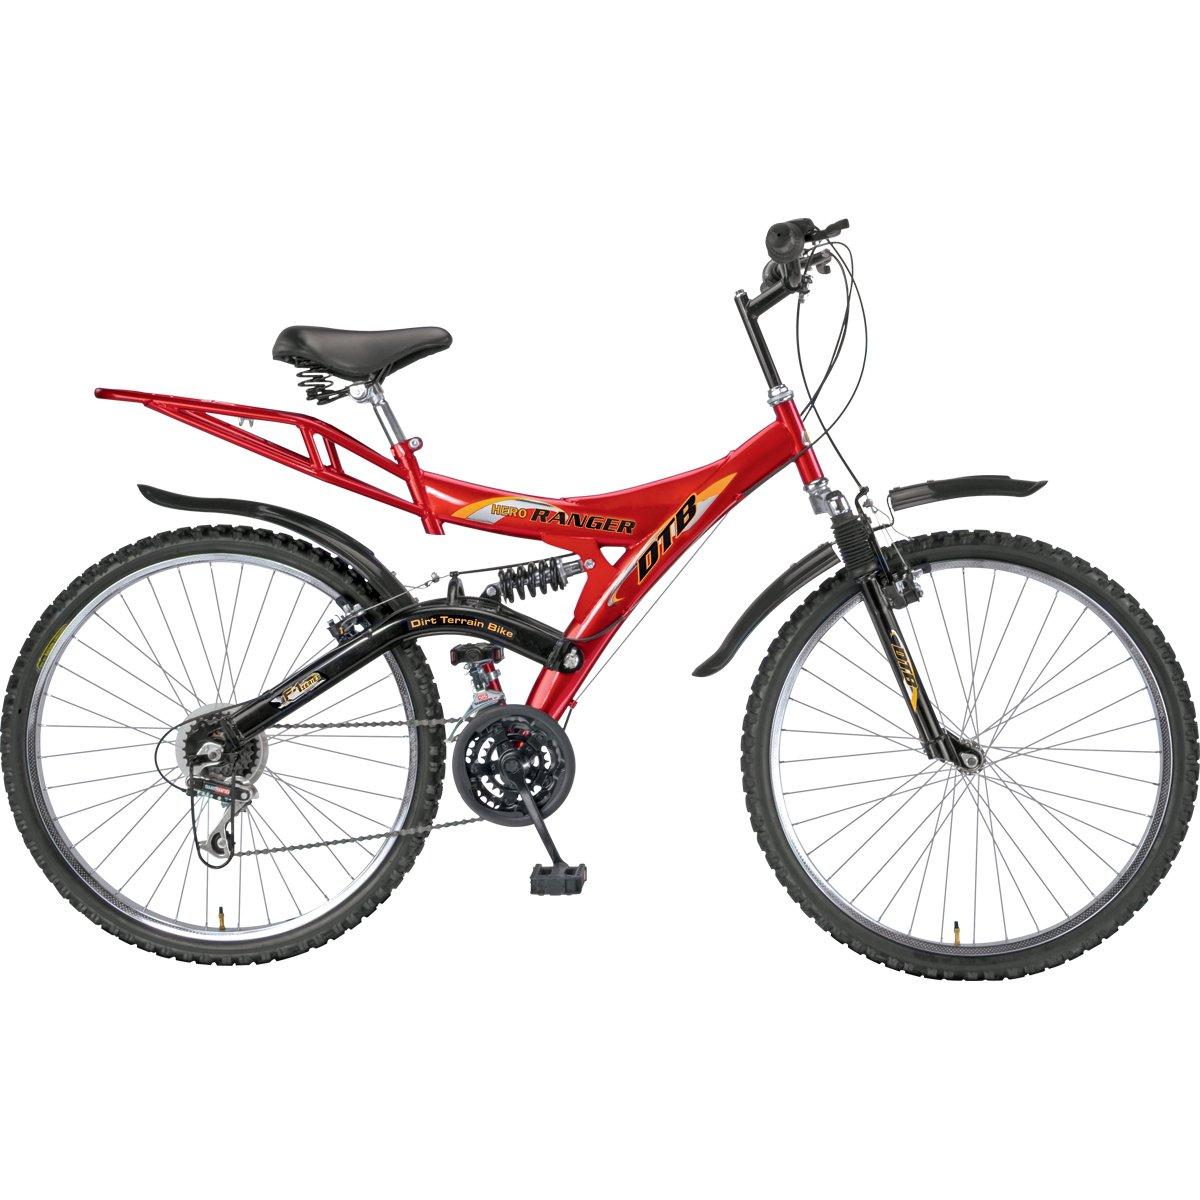 Buy Hero Ranger Dtb Vx 26t 18 Speed Mountain Bike Black Red Online Bak Mandi Bayi Rainbow At Low Prices In India